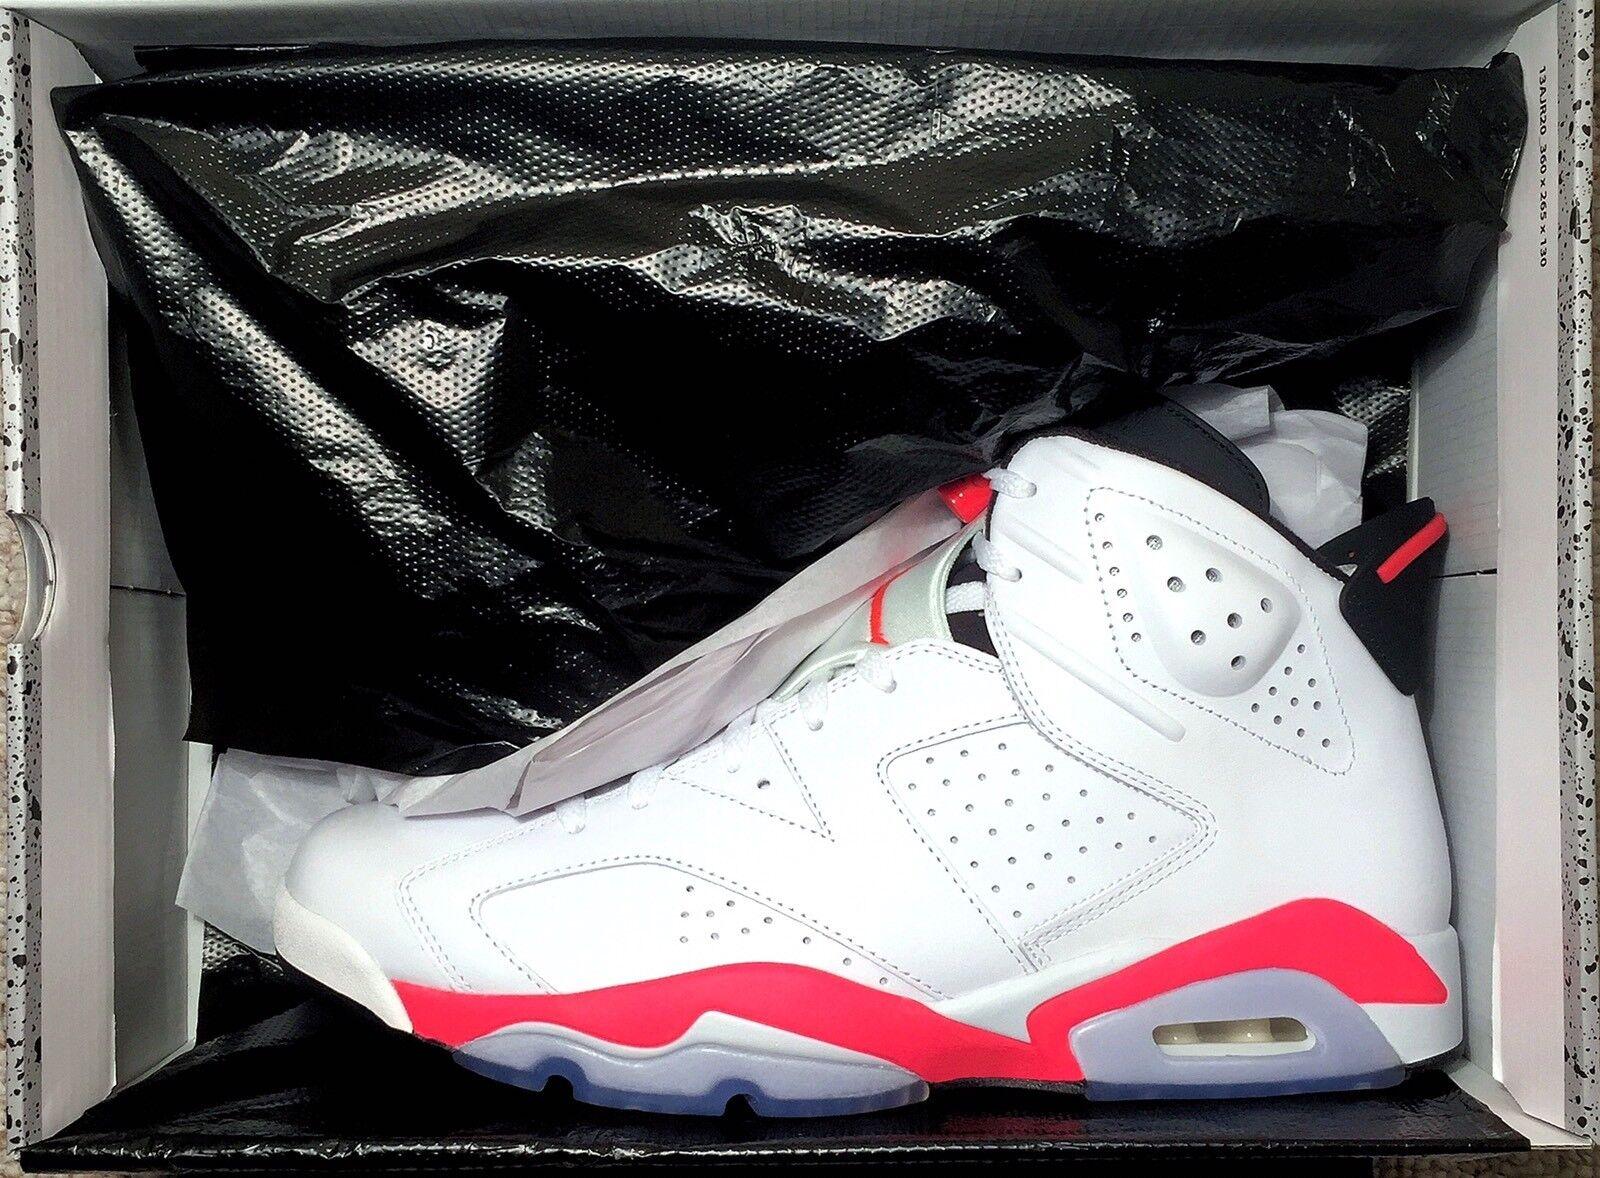 Nike Air Jordan 6 Retro WHITE INFRARED Size 12 Black Bred Cement JTH 3 11 1 4 13